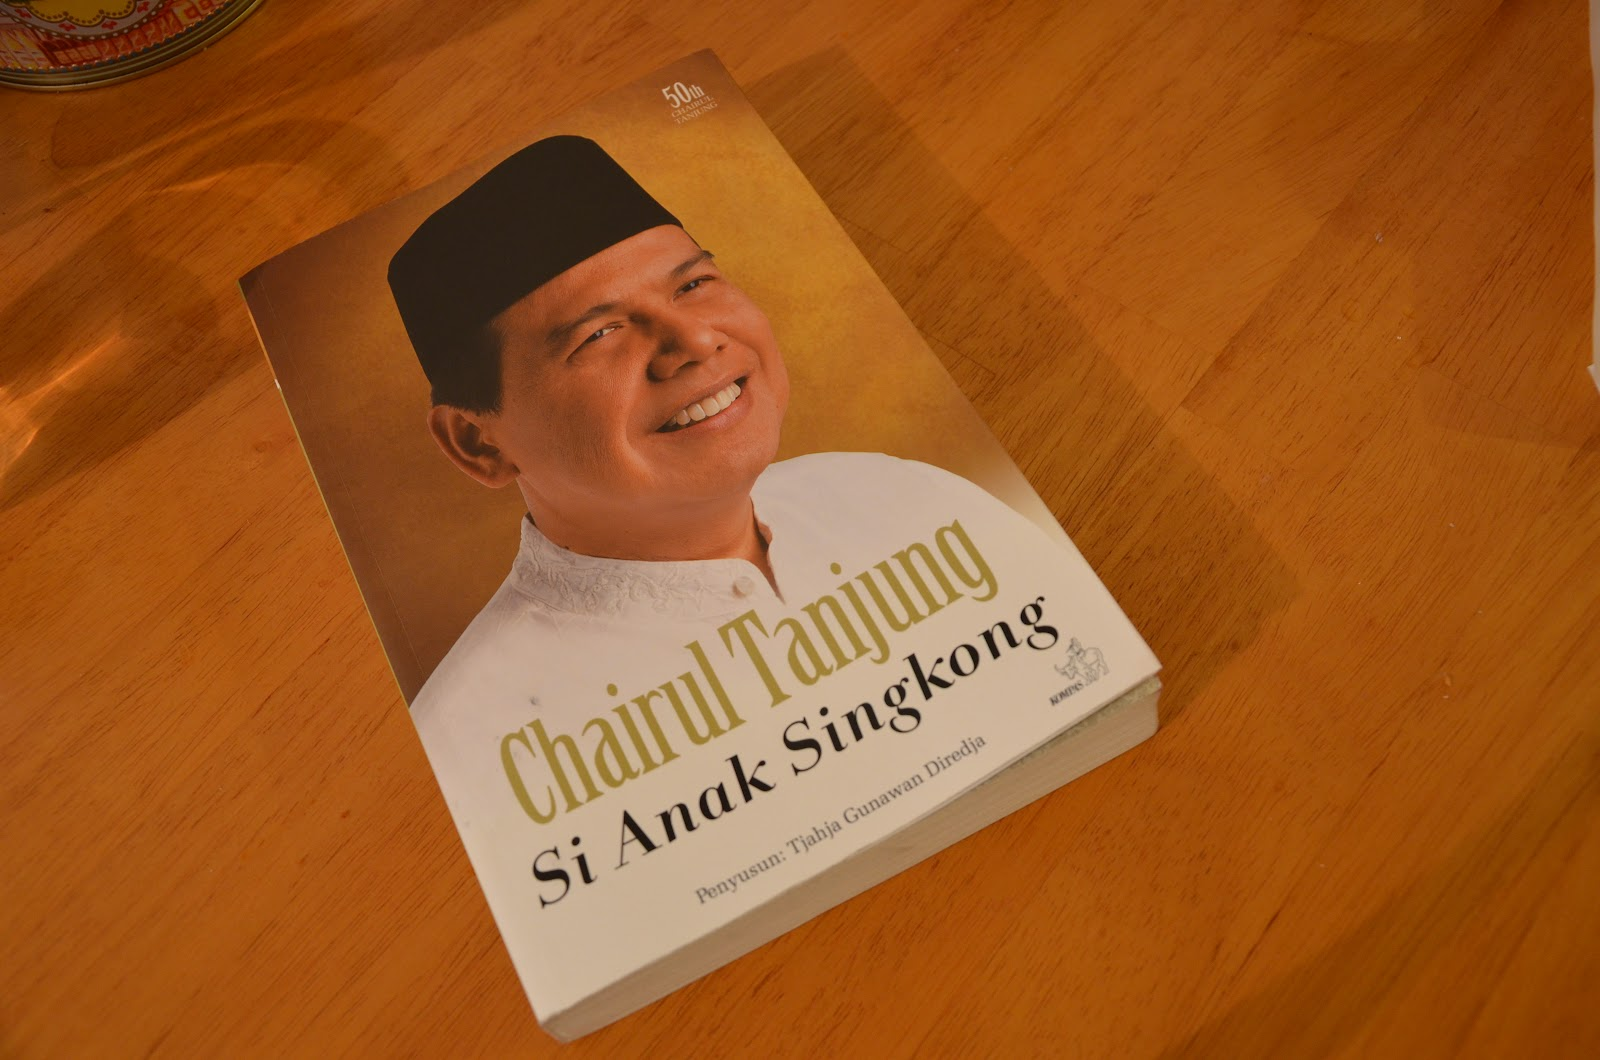 Chairul Tanjung Black Linen Chair Covers Meditya 39s Notes Ulasan Biografi